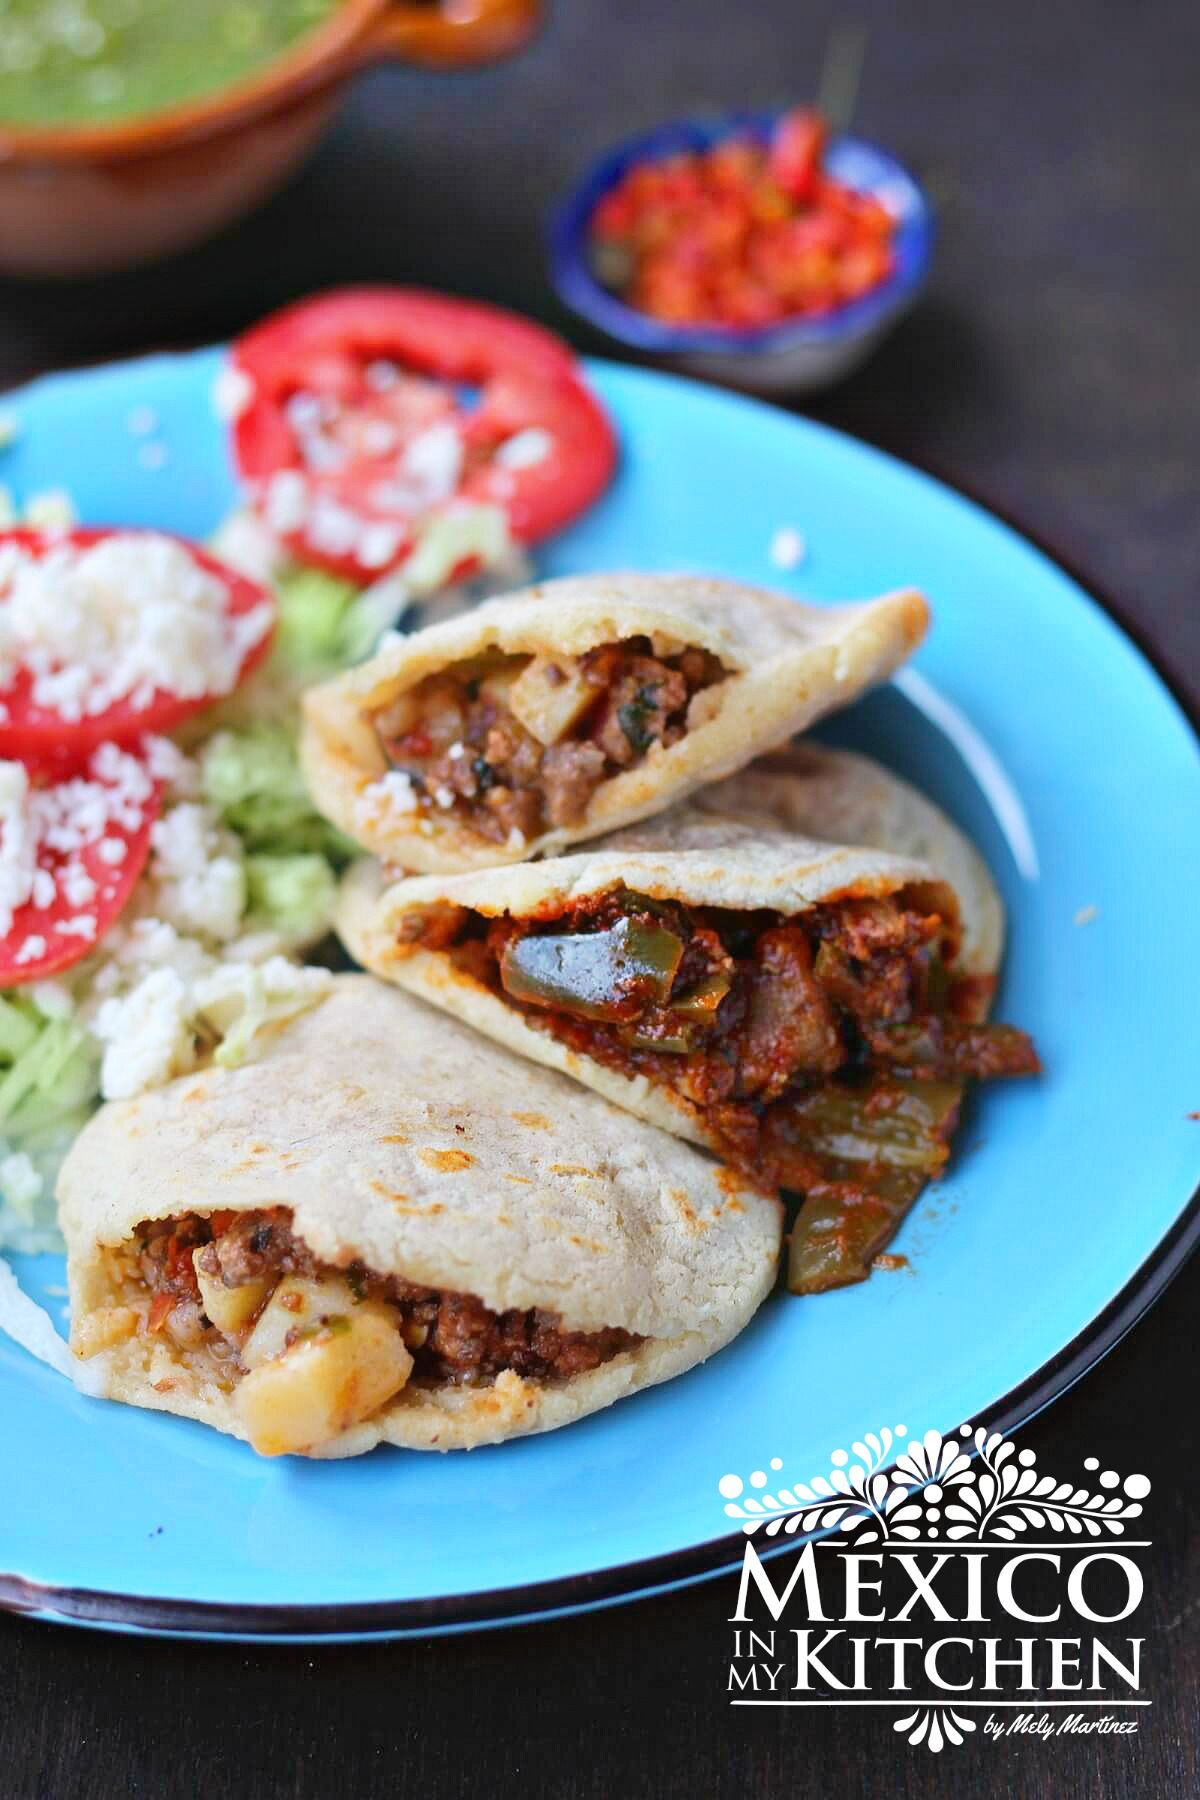 Gorditas Recipe How To Make Gorditas Tutorial Mexico In My